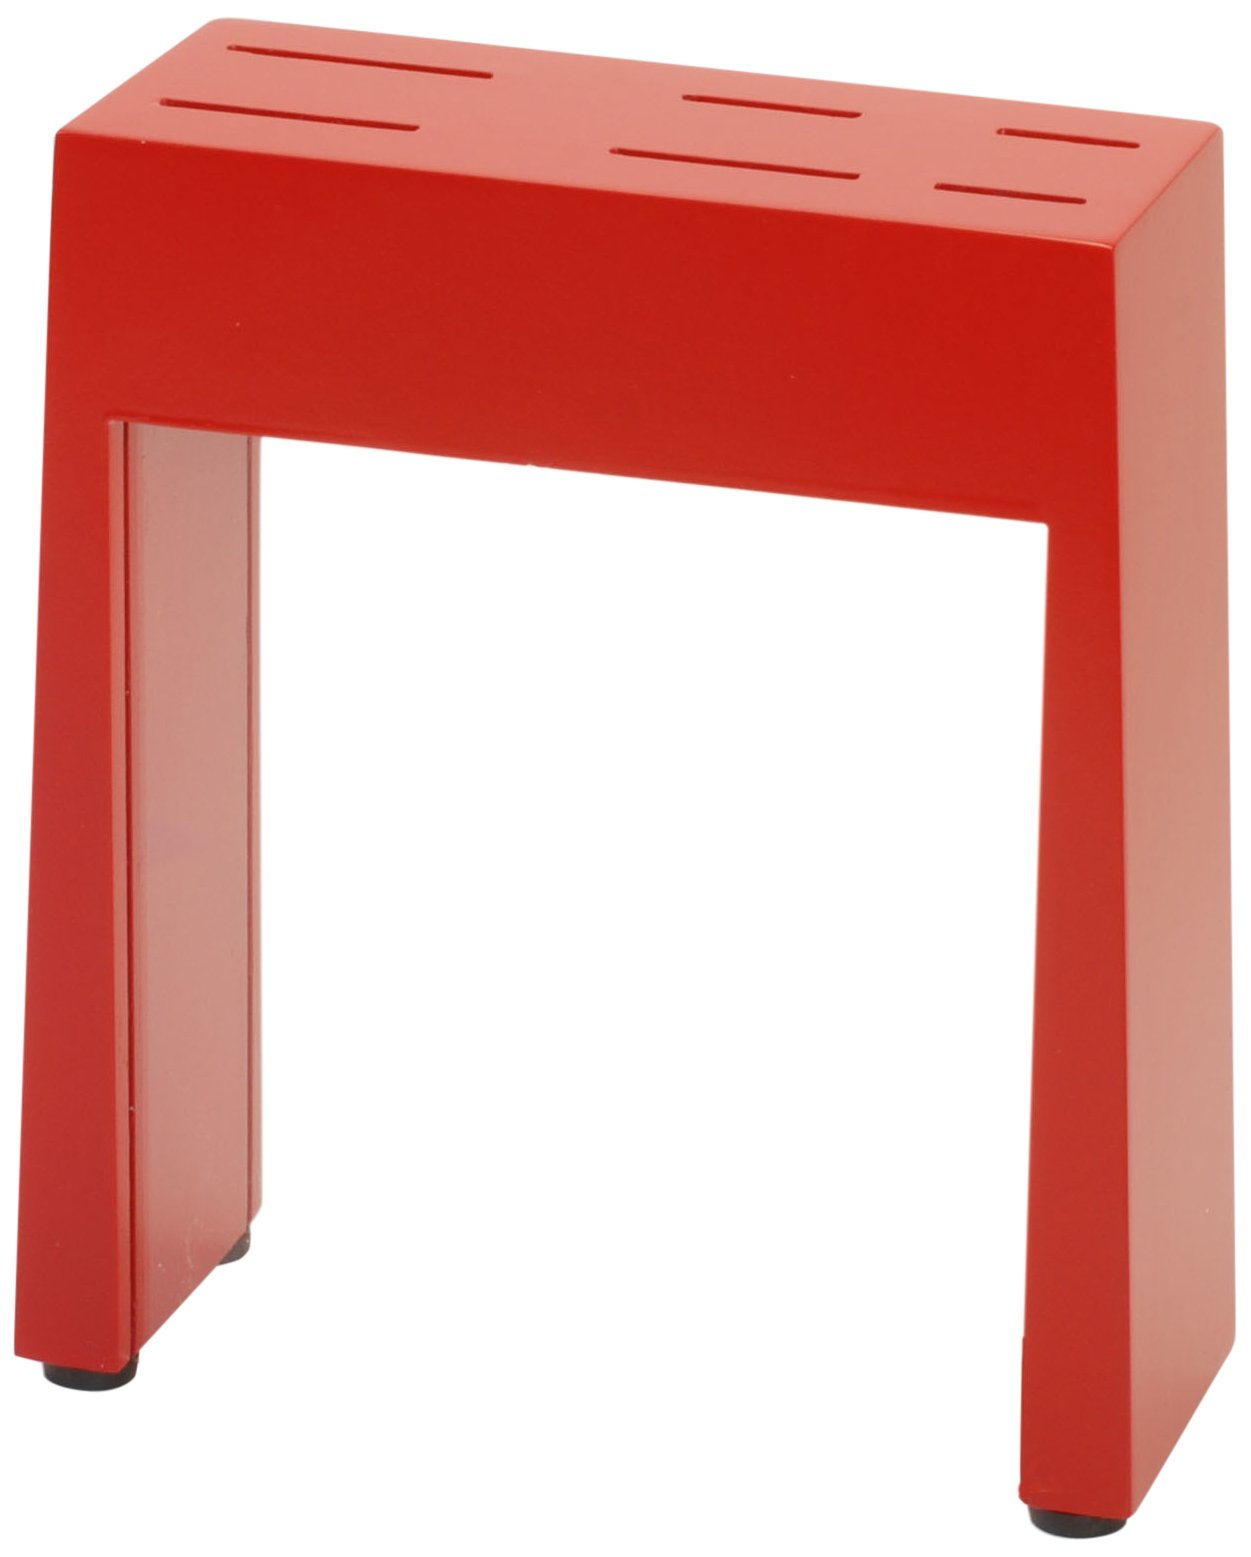 Gela Global See Thru Window Counter Knife Block, Red